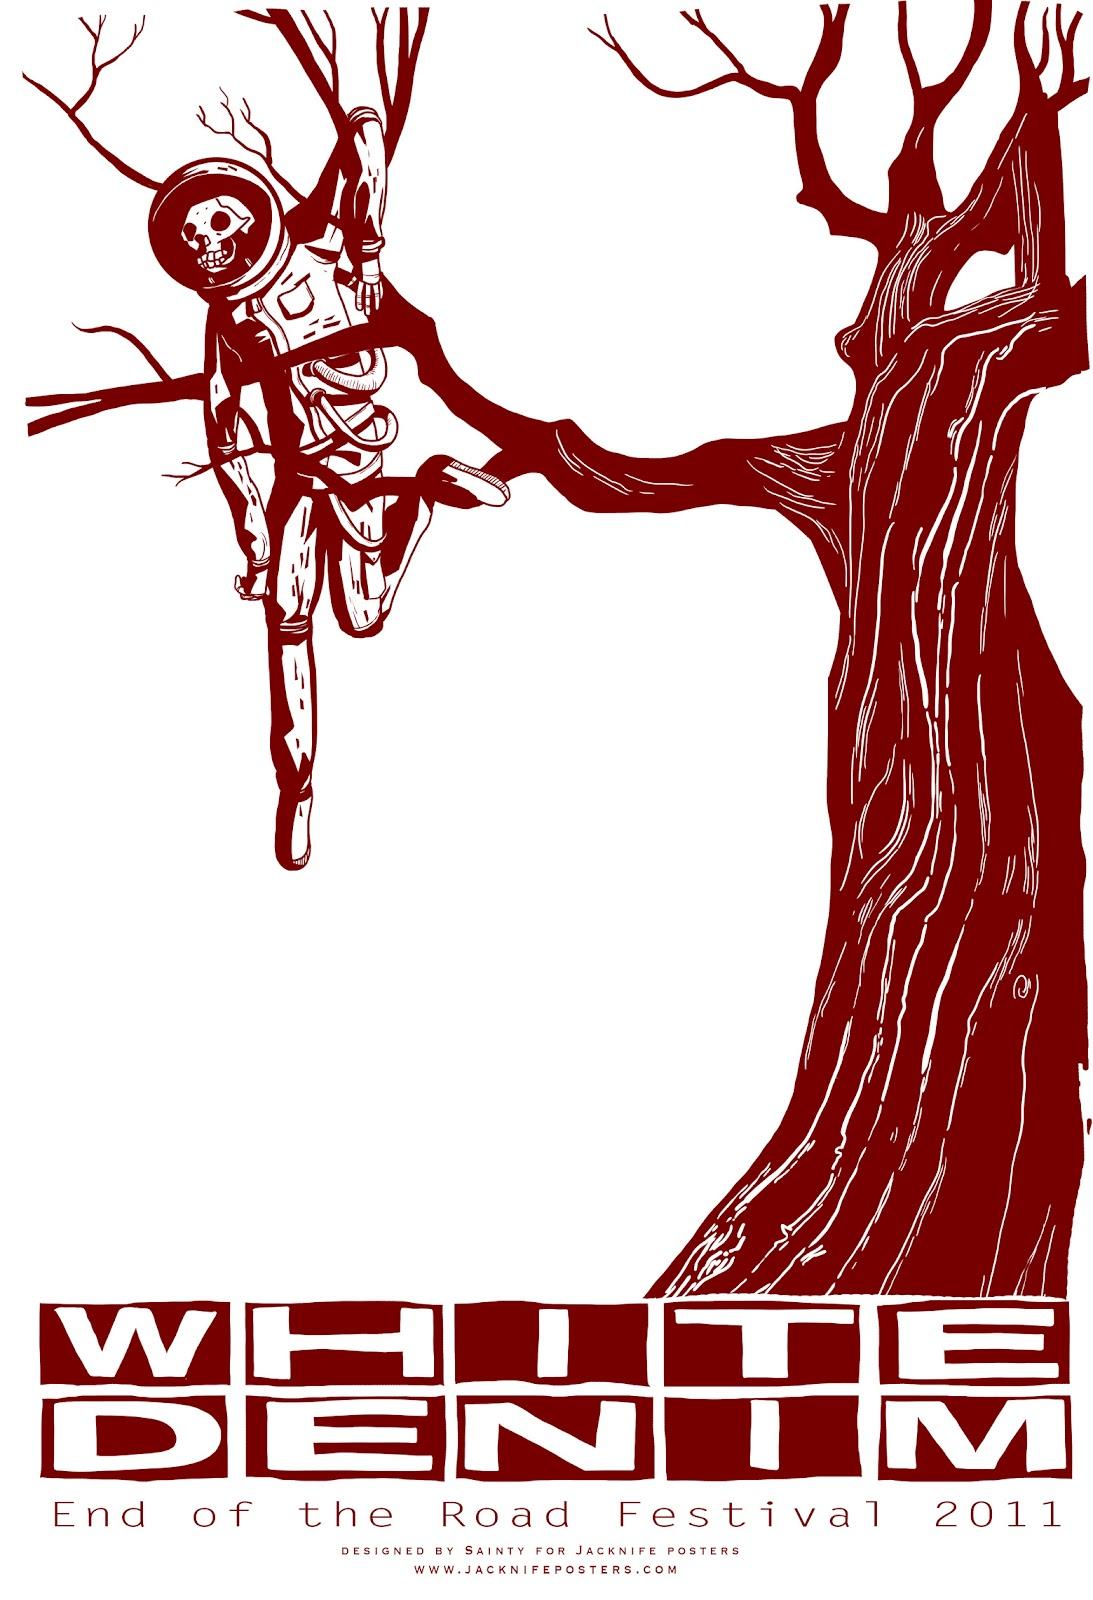 Crewkoos Rock Poster Artists Interviews: Jacknife Posters (UK)